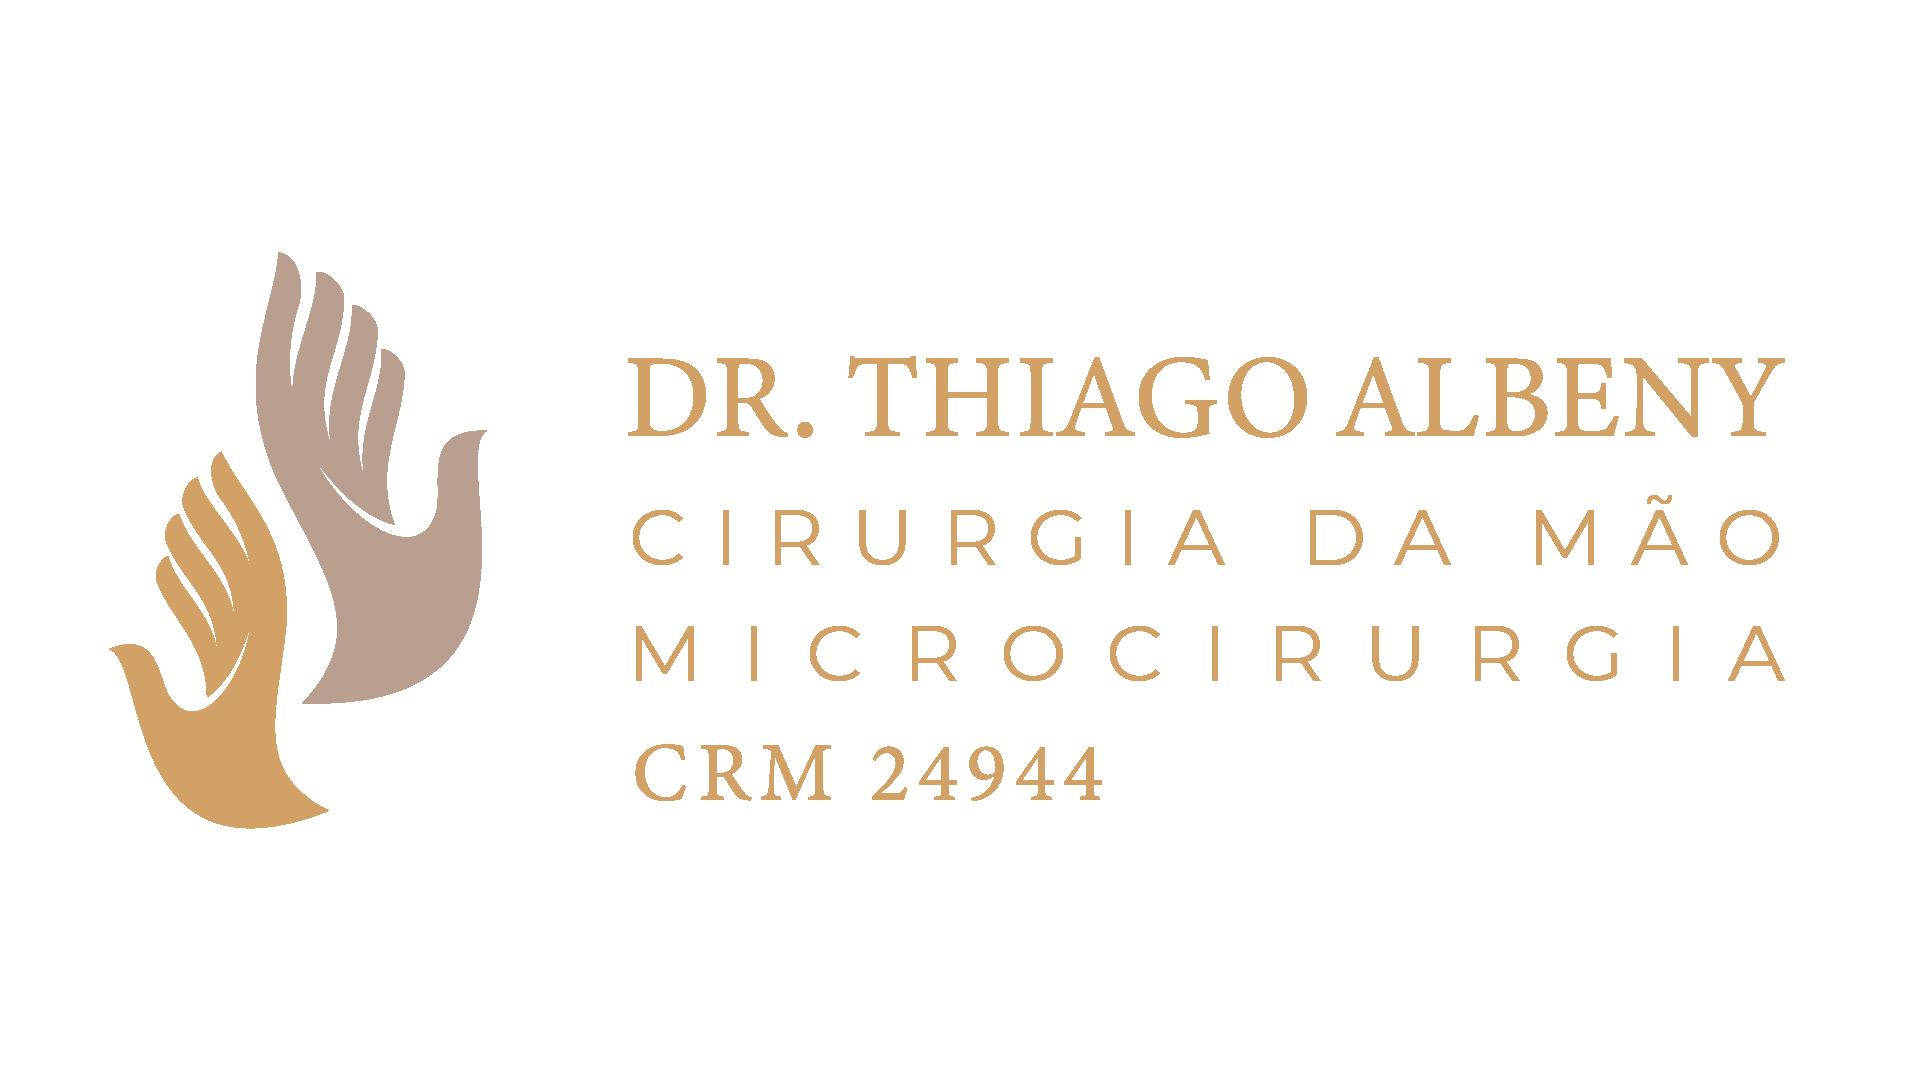 Dr. Thiago Albeny